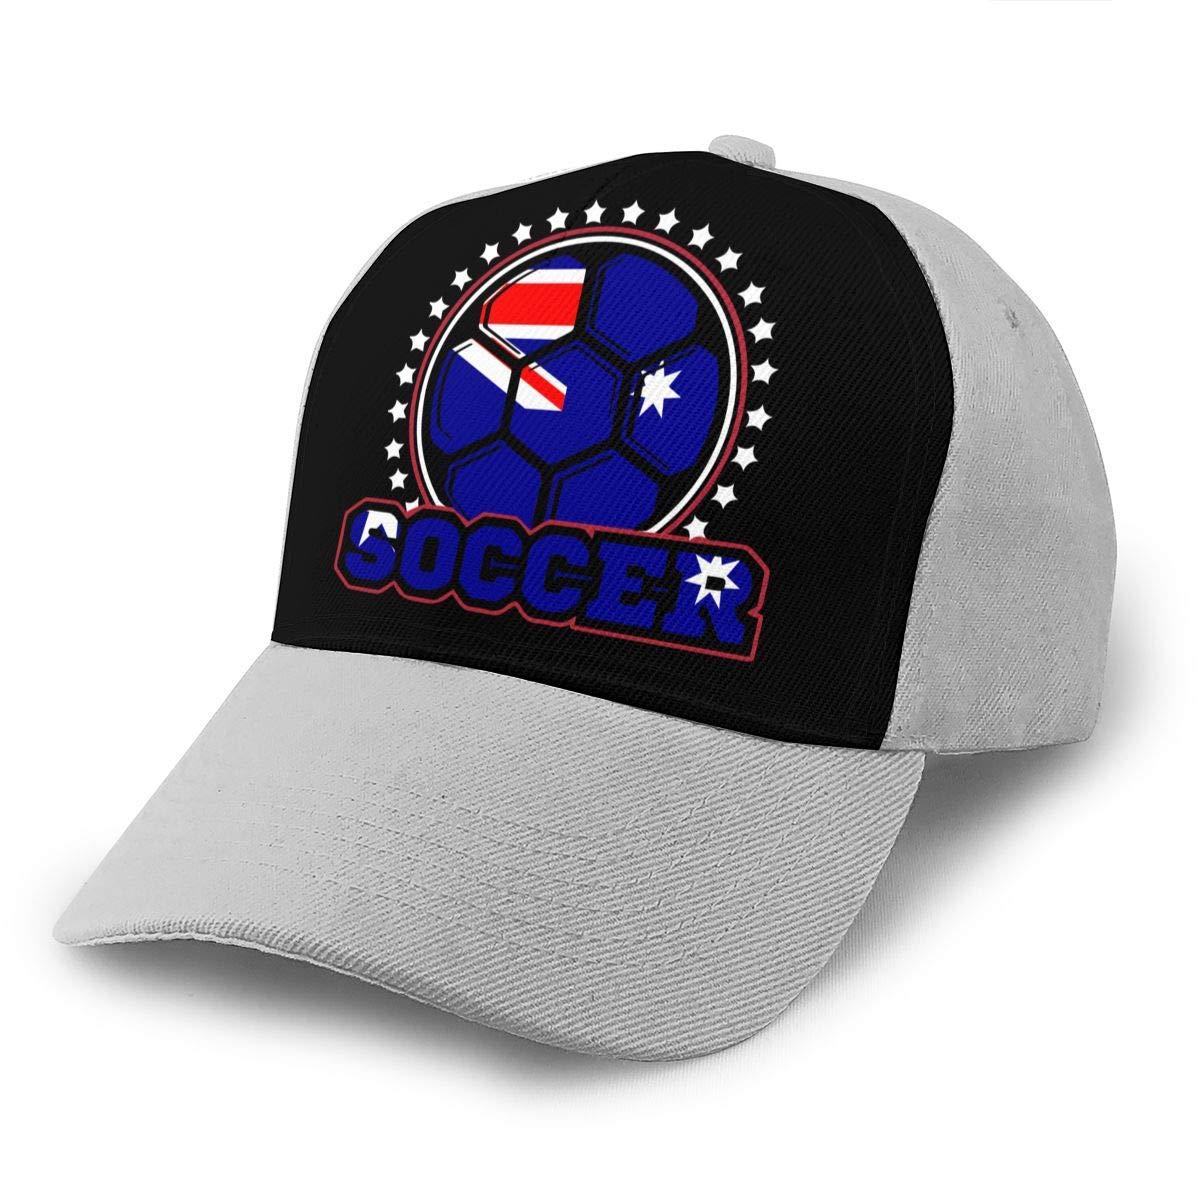 Y94OIW@MAO Australian Flag Soccer Player Trucker Hat for Men and Women Cotton Sports Cap